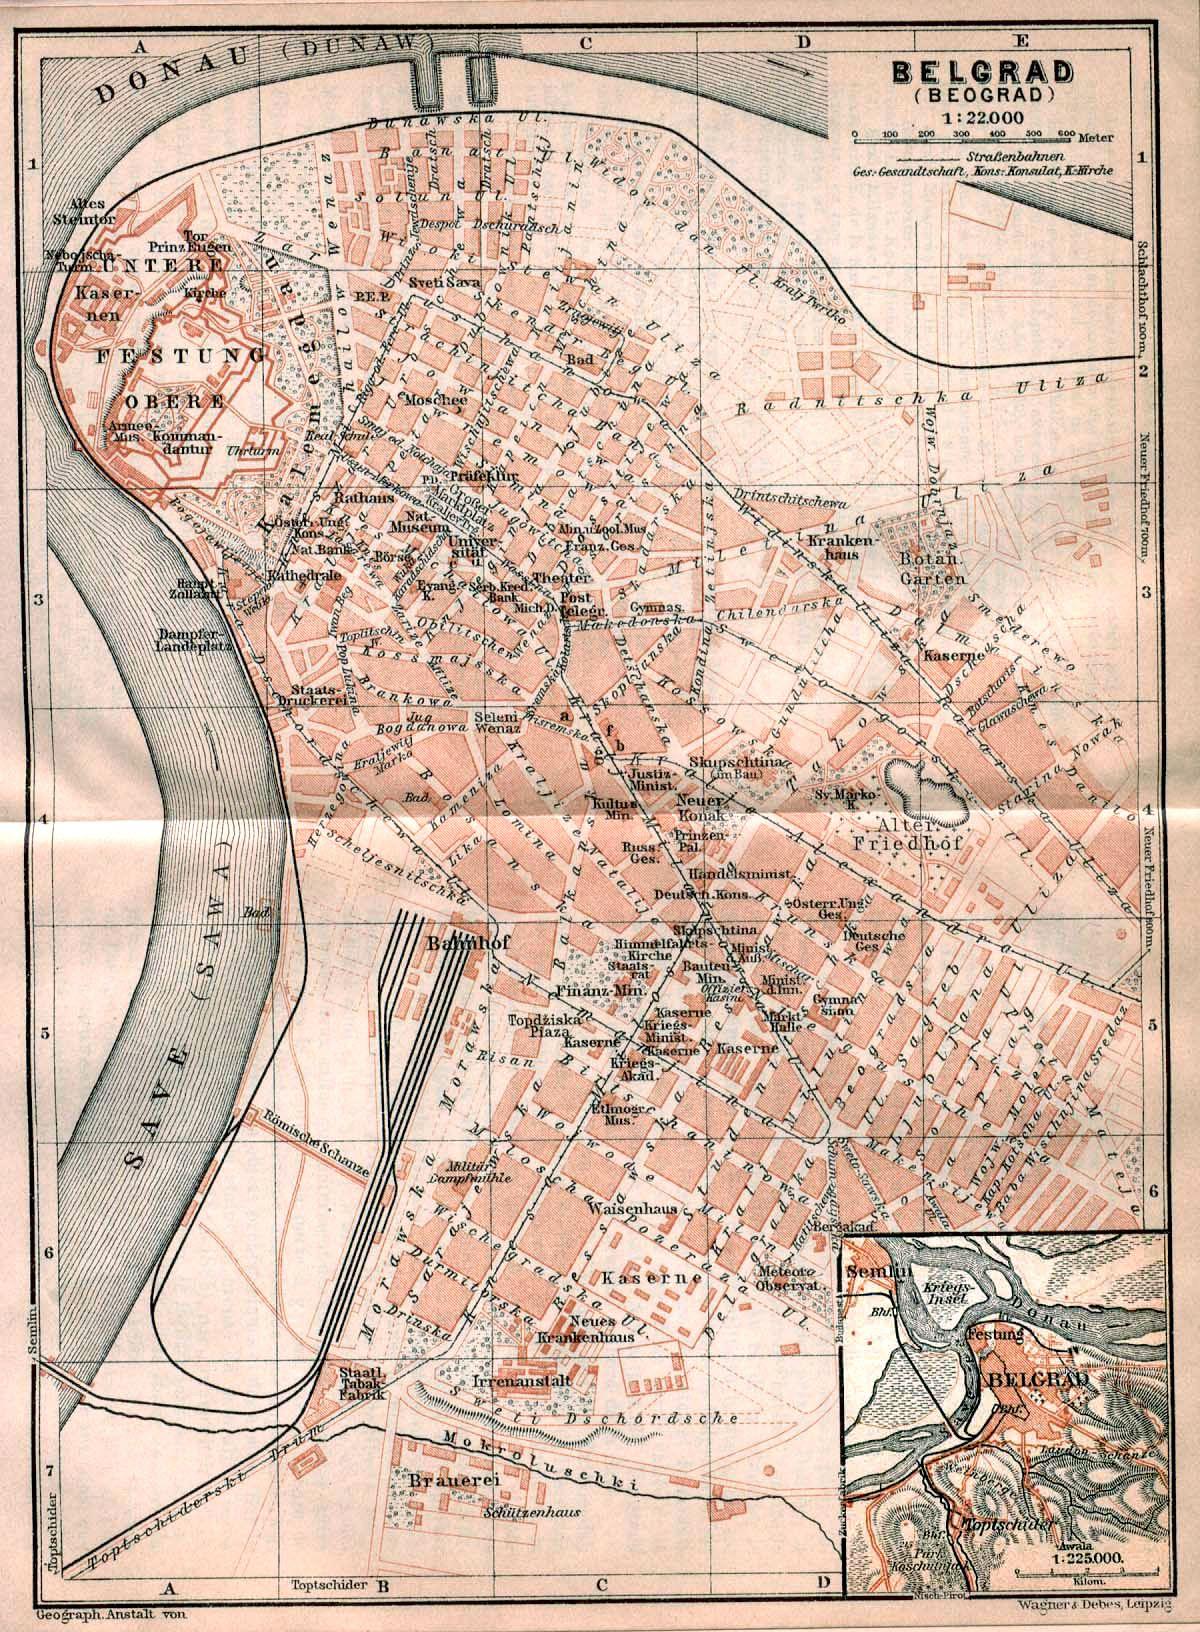 sajmiste beograd mapa Map of Belgrade (Beograd) 1905 | Maps | Pinterest | Belgrade and City sajmiste beograd mapa